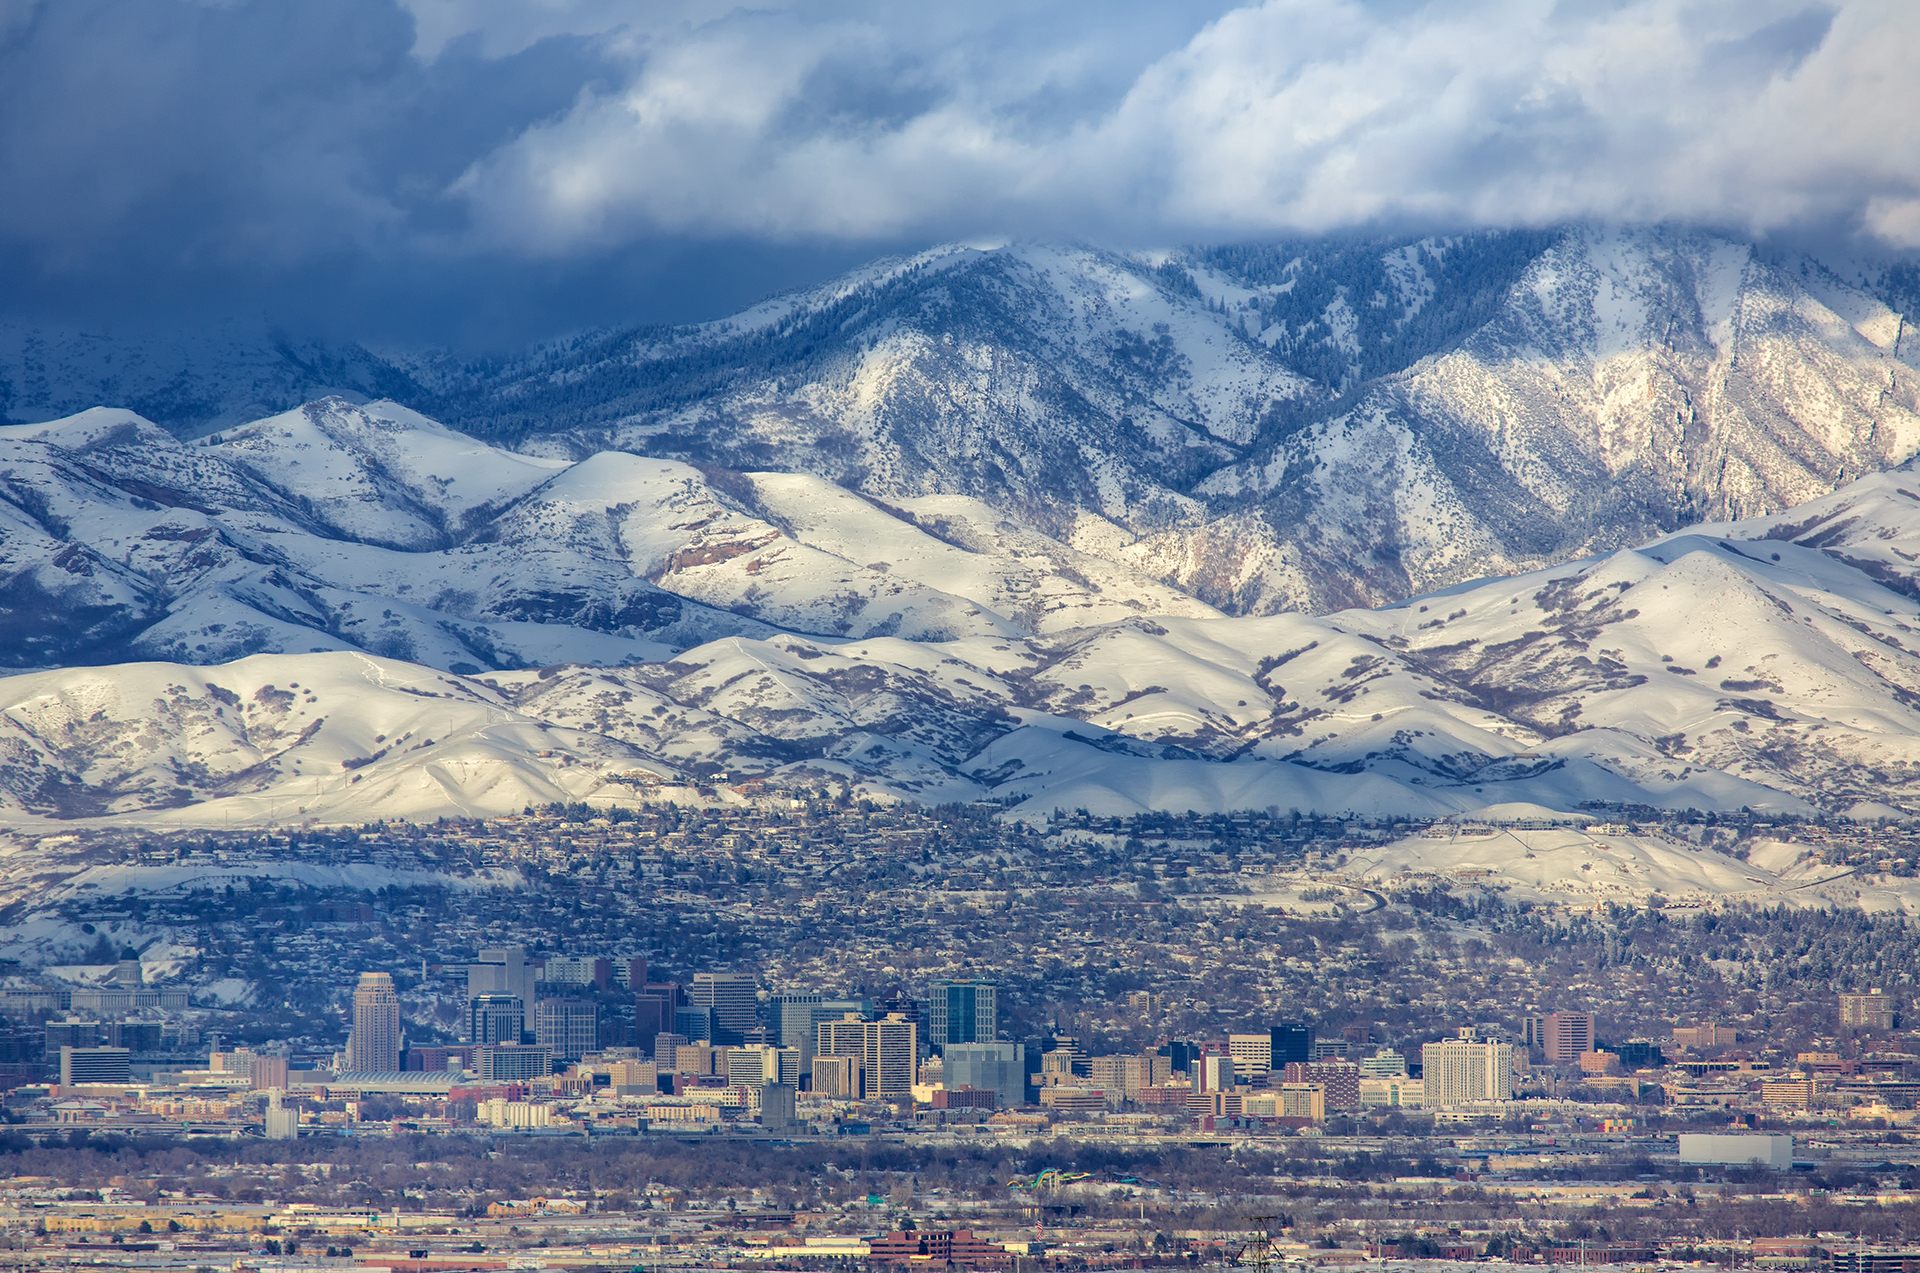 North Salt Lake City Hotels